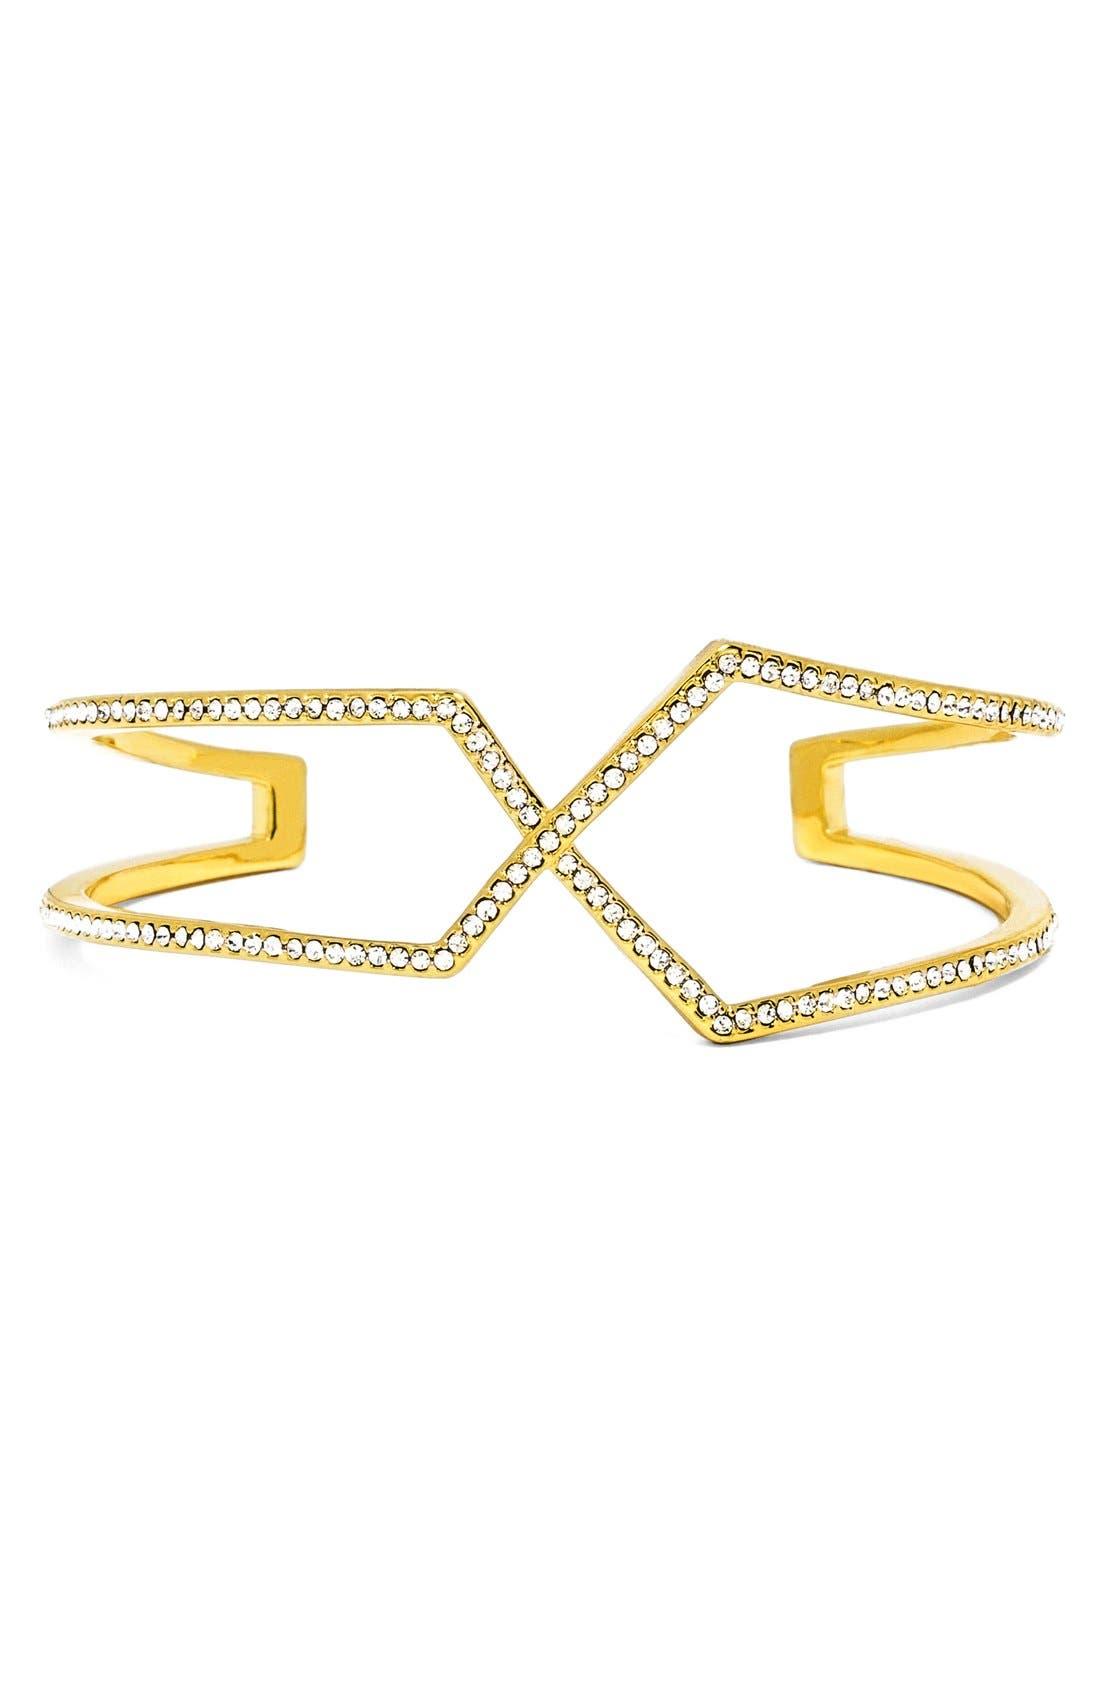 Main Image - BaubleBar'Siphon' Cuff Bracelet